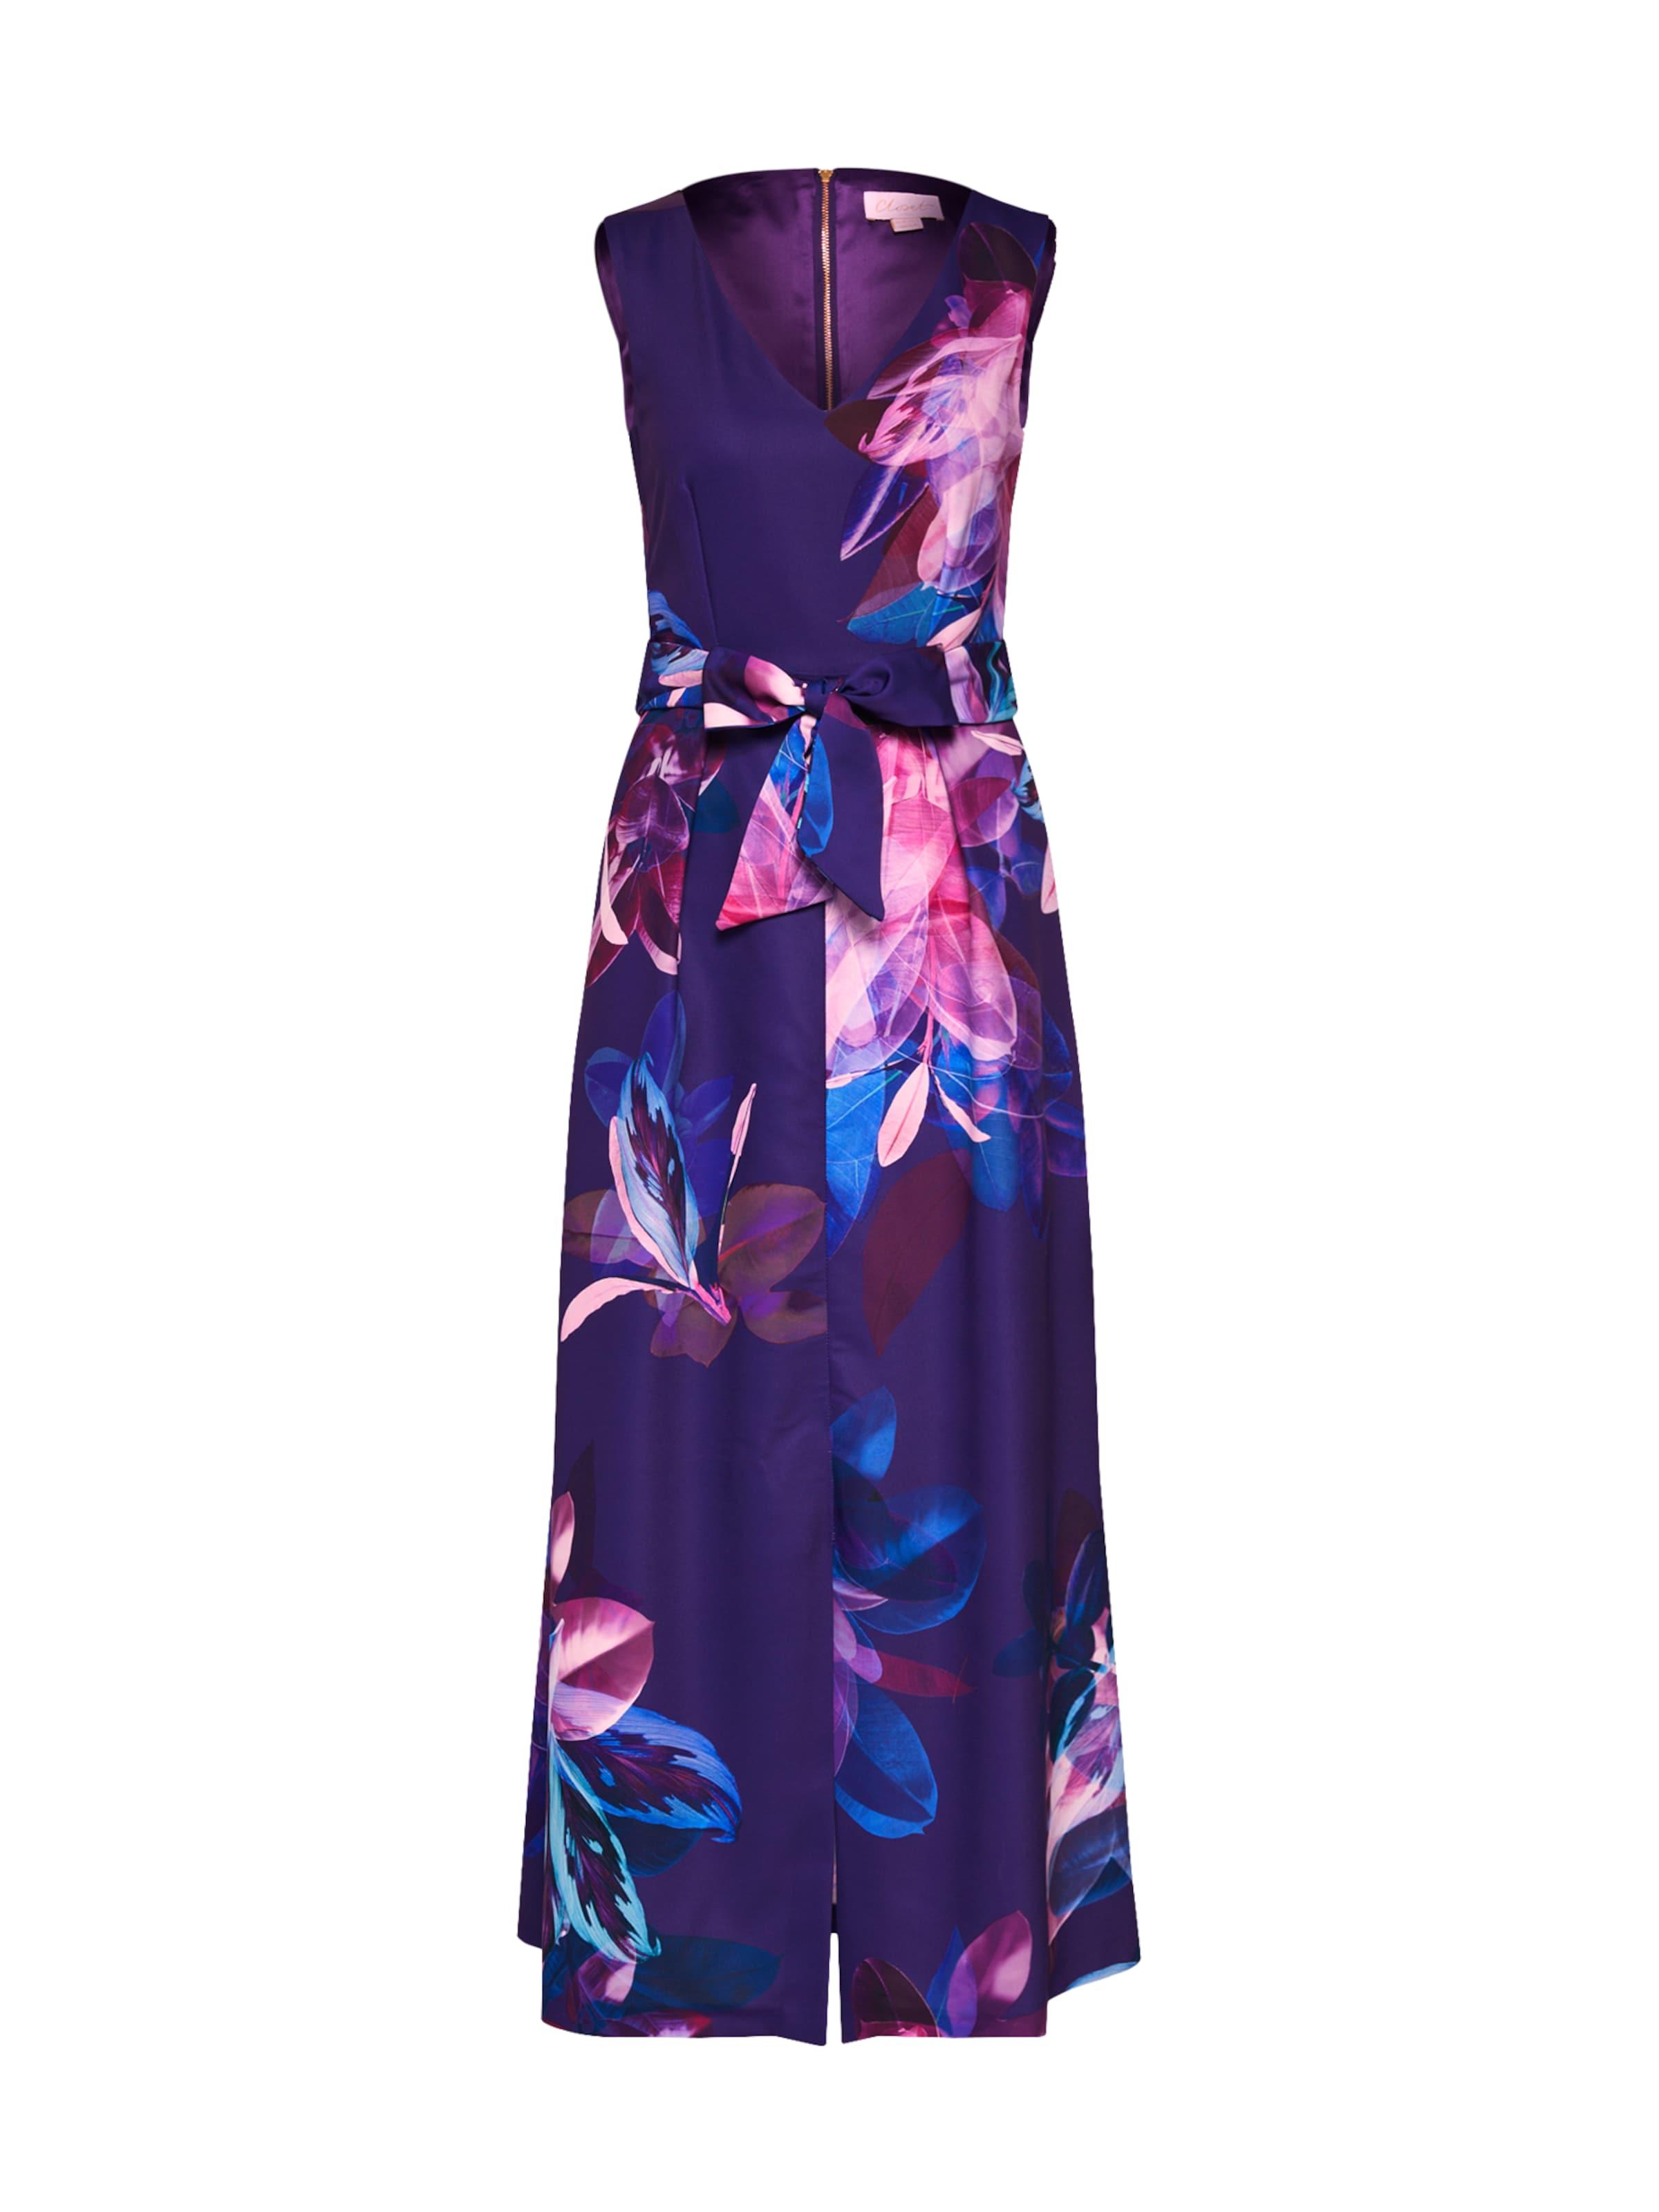 Dress' London Maxi Blaulila Closet In 34rl5qaj Gold 'closet Kleid BexrdCo